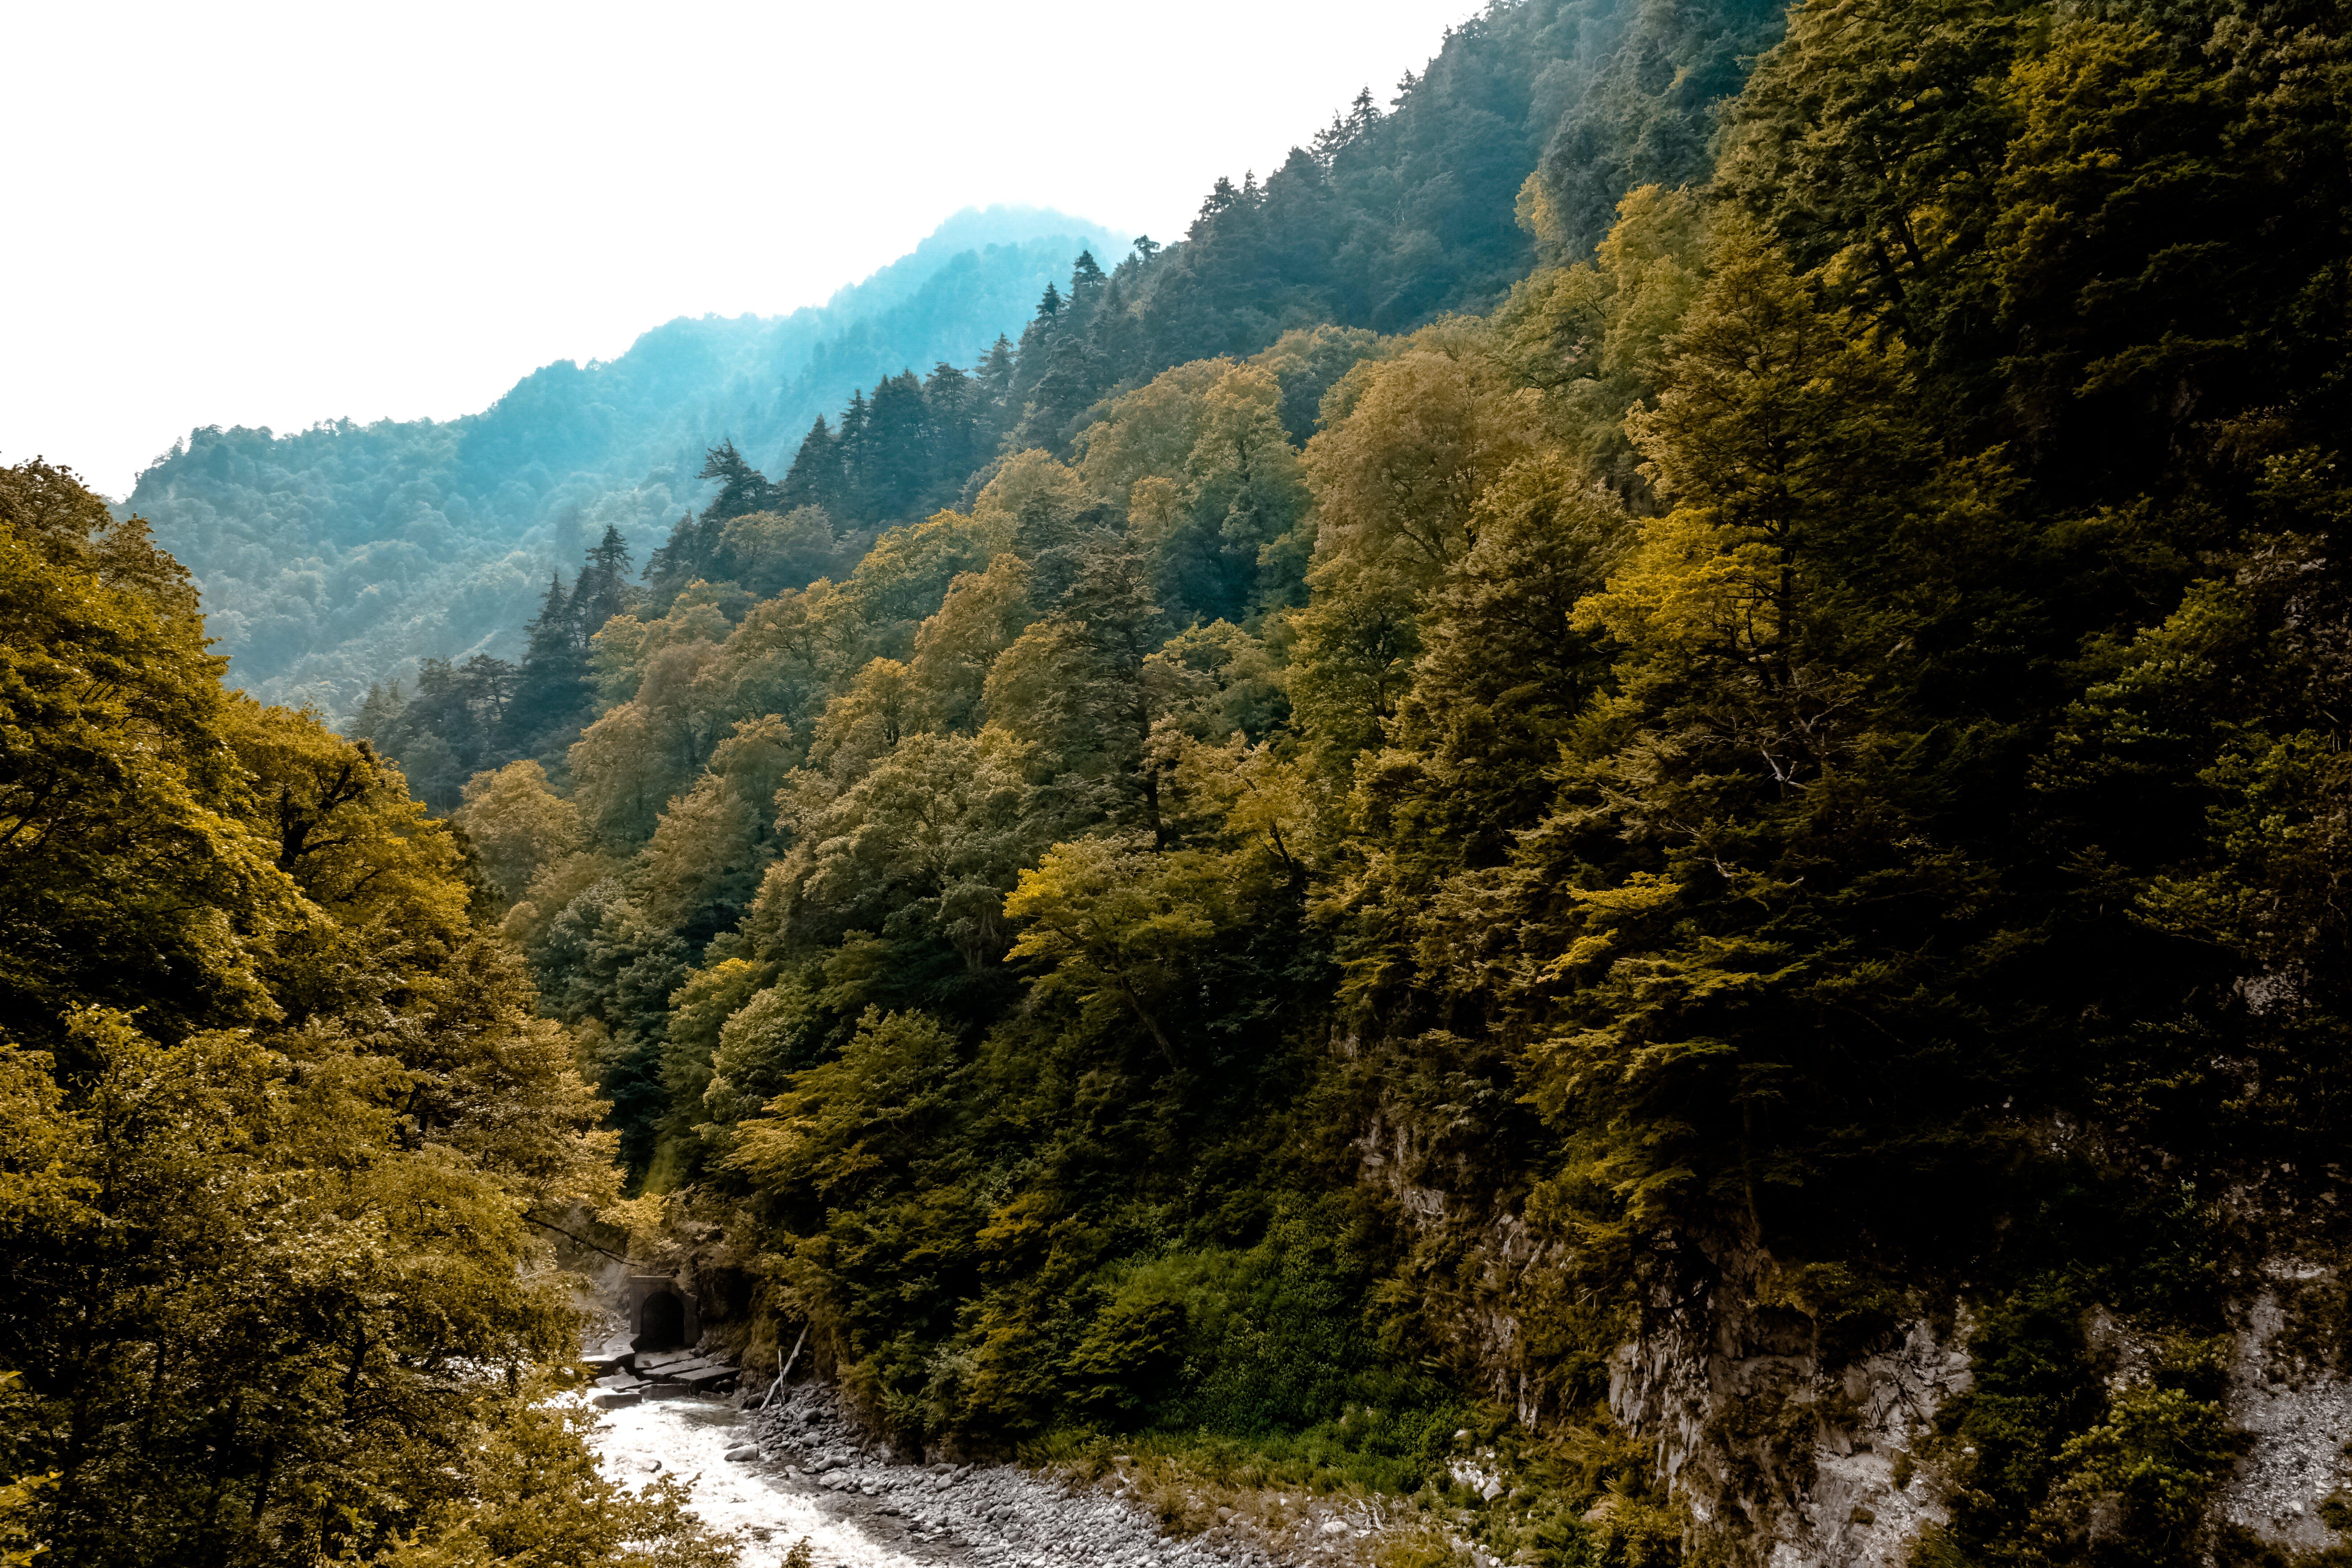 Gratis lagerfoto af bjerge, landskab, natur, skov